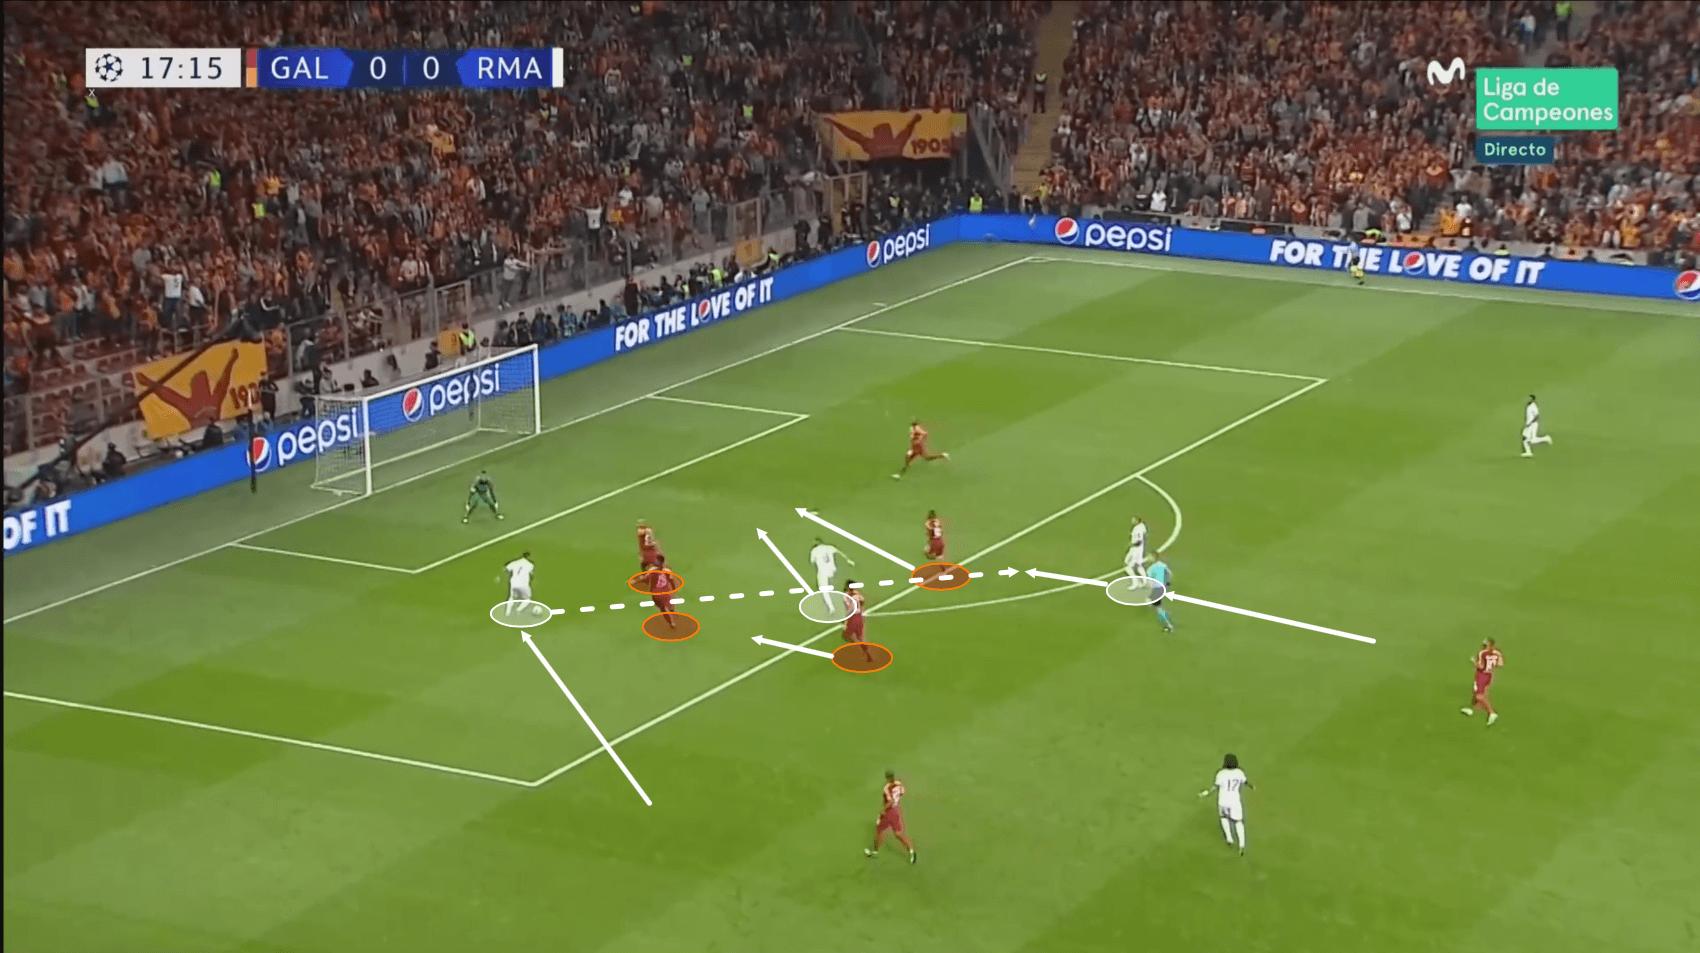 UEFA Champions League 2019/20: Galatasaray vs Real Madrid – tactical analysis tactics